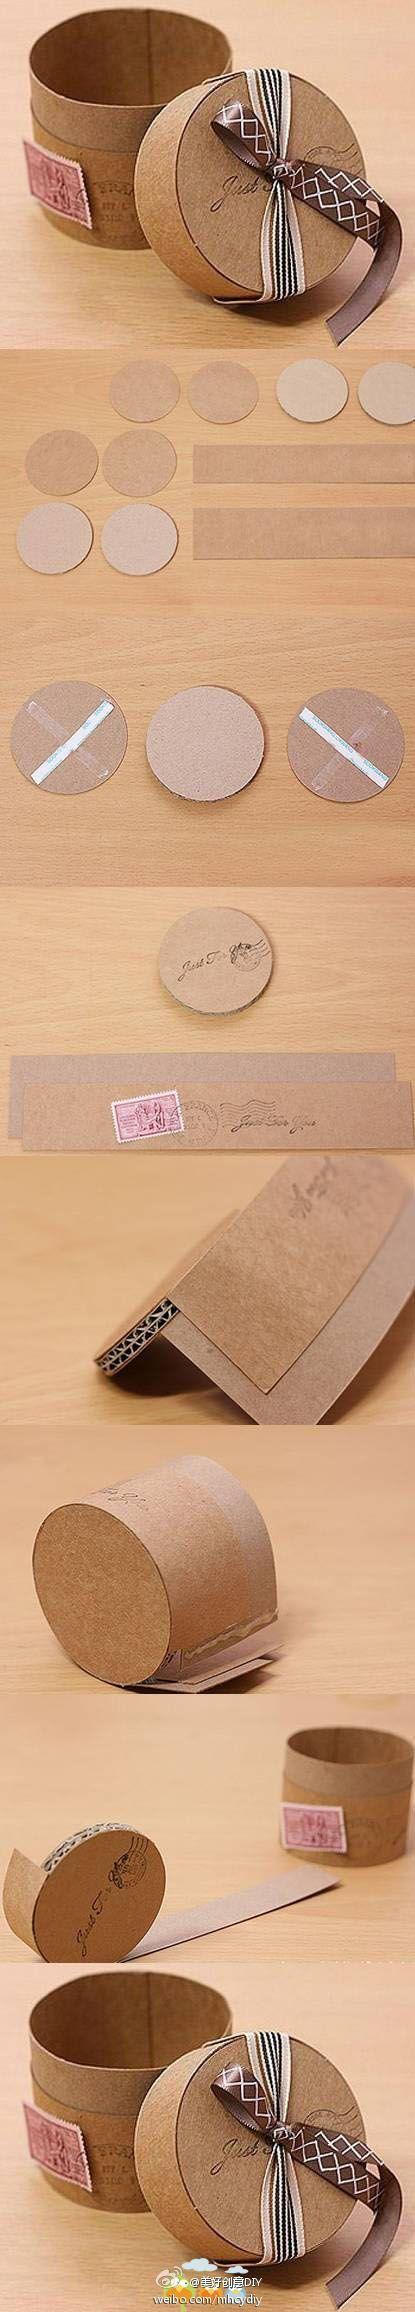 DIY Petite boîte en carton ronde http://www.weibo.com